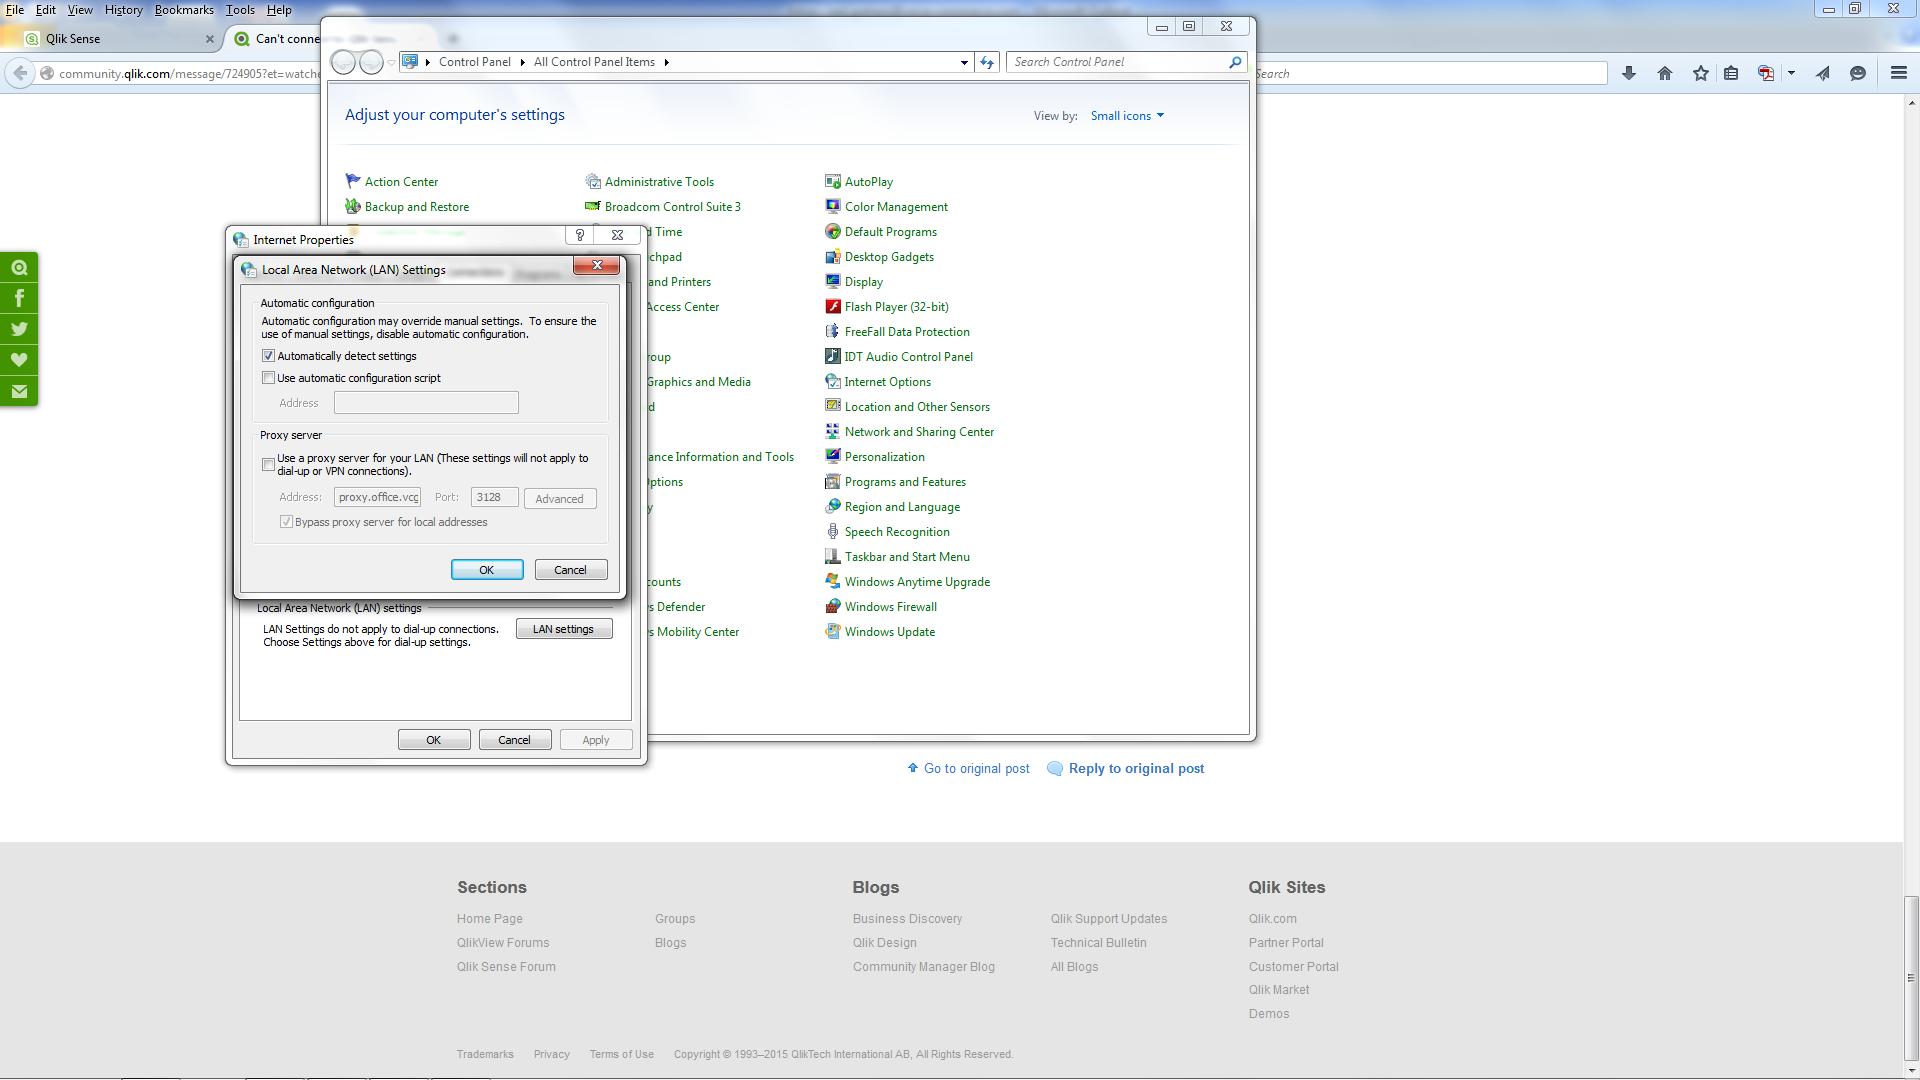 Re: Can't connect to Qlik Sense Desktop